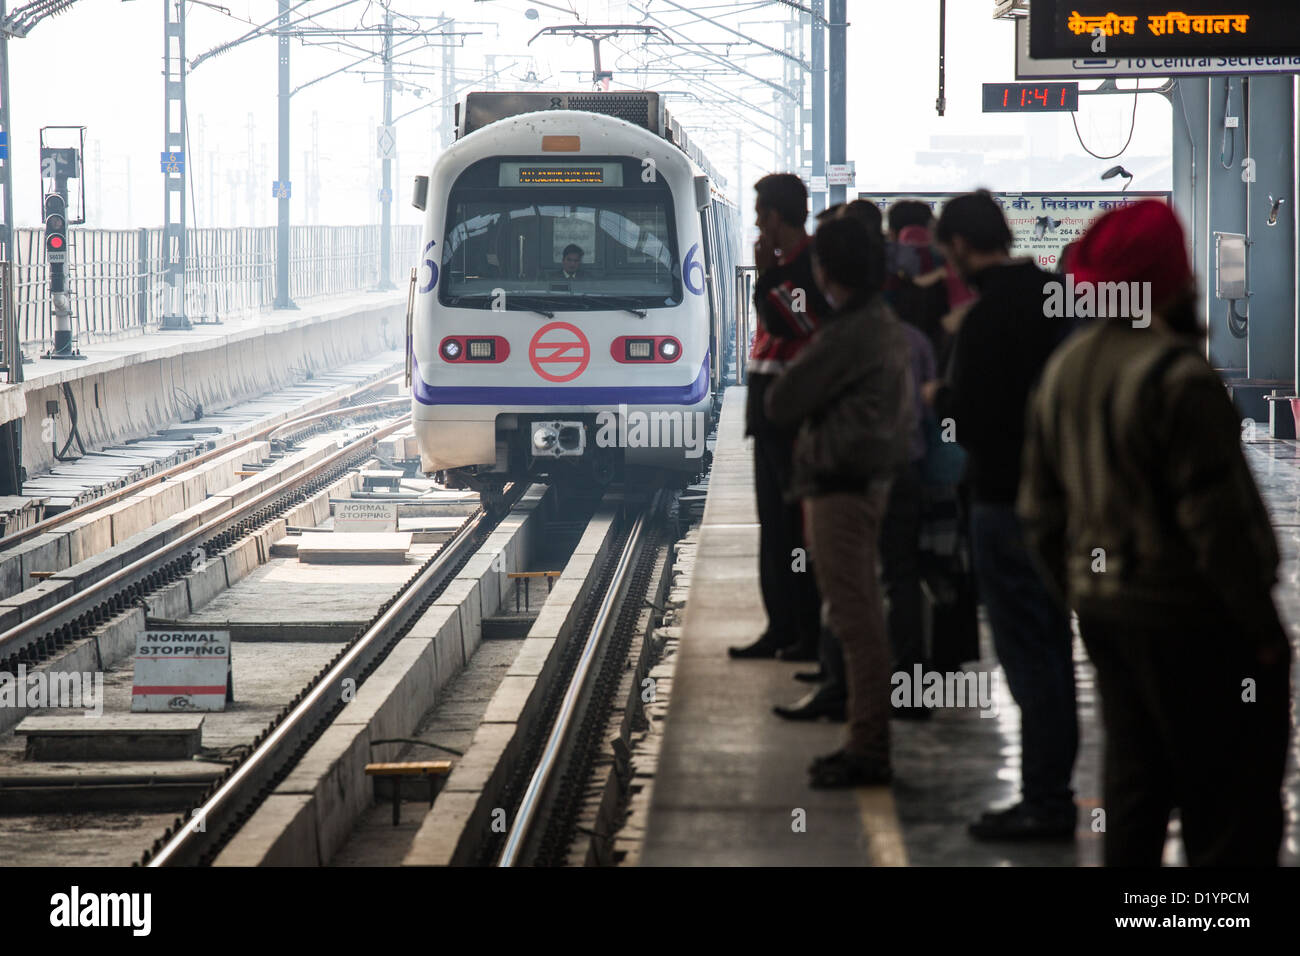 Delhi Metro Stock Photos & Delhi Metro Stock Images - Alamy